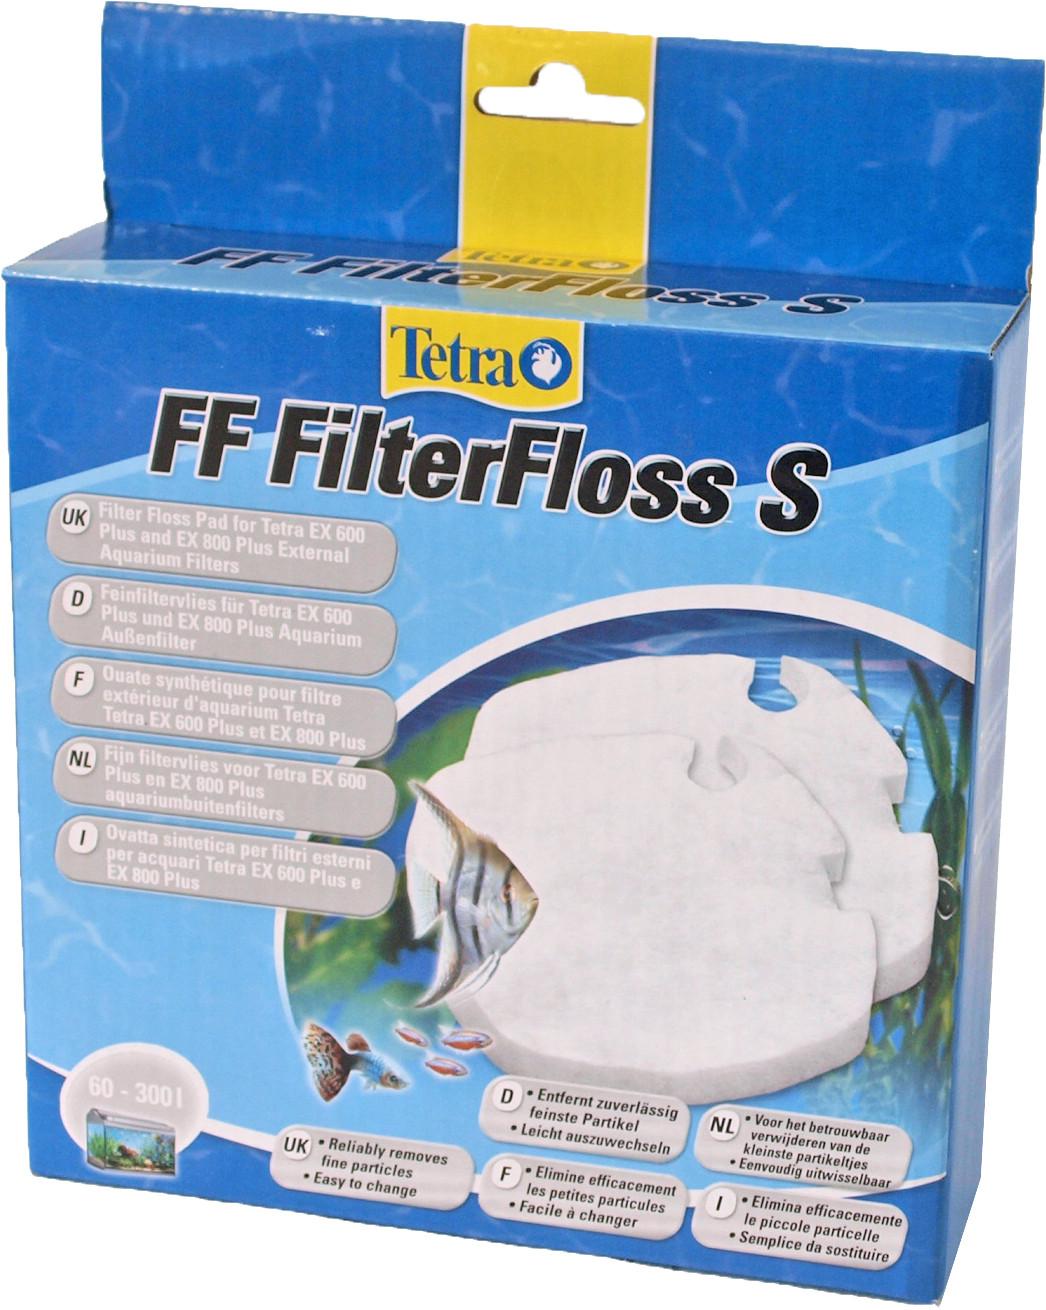 Tetra filterfloss S 2 st